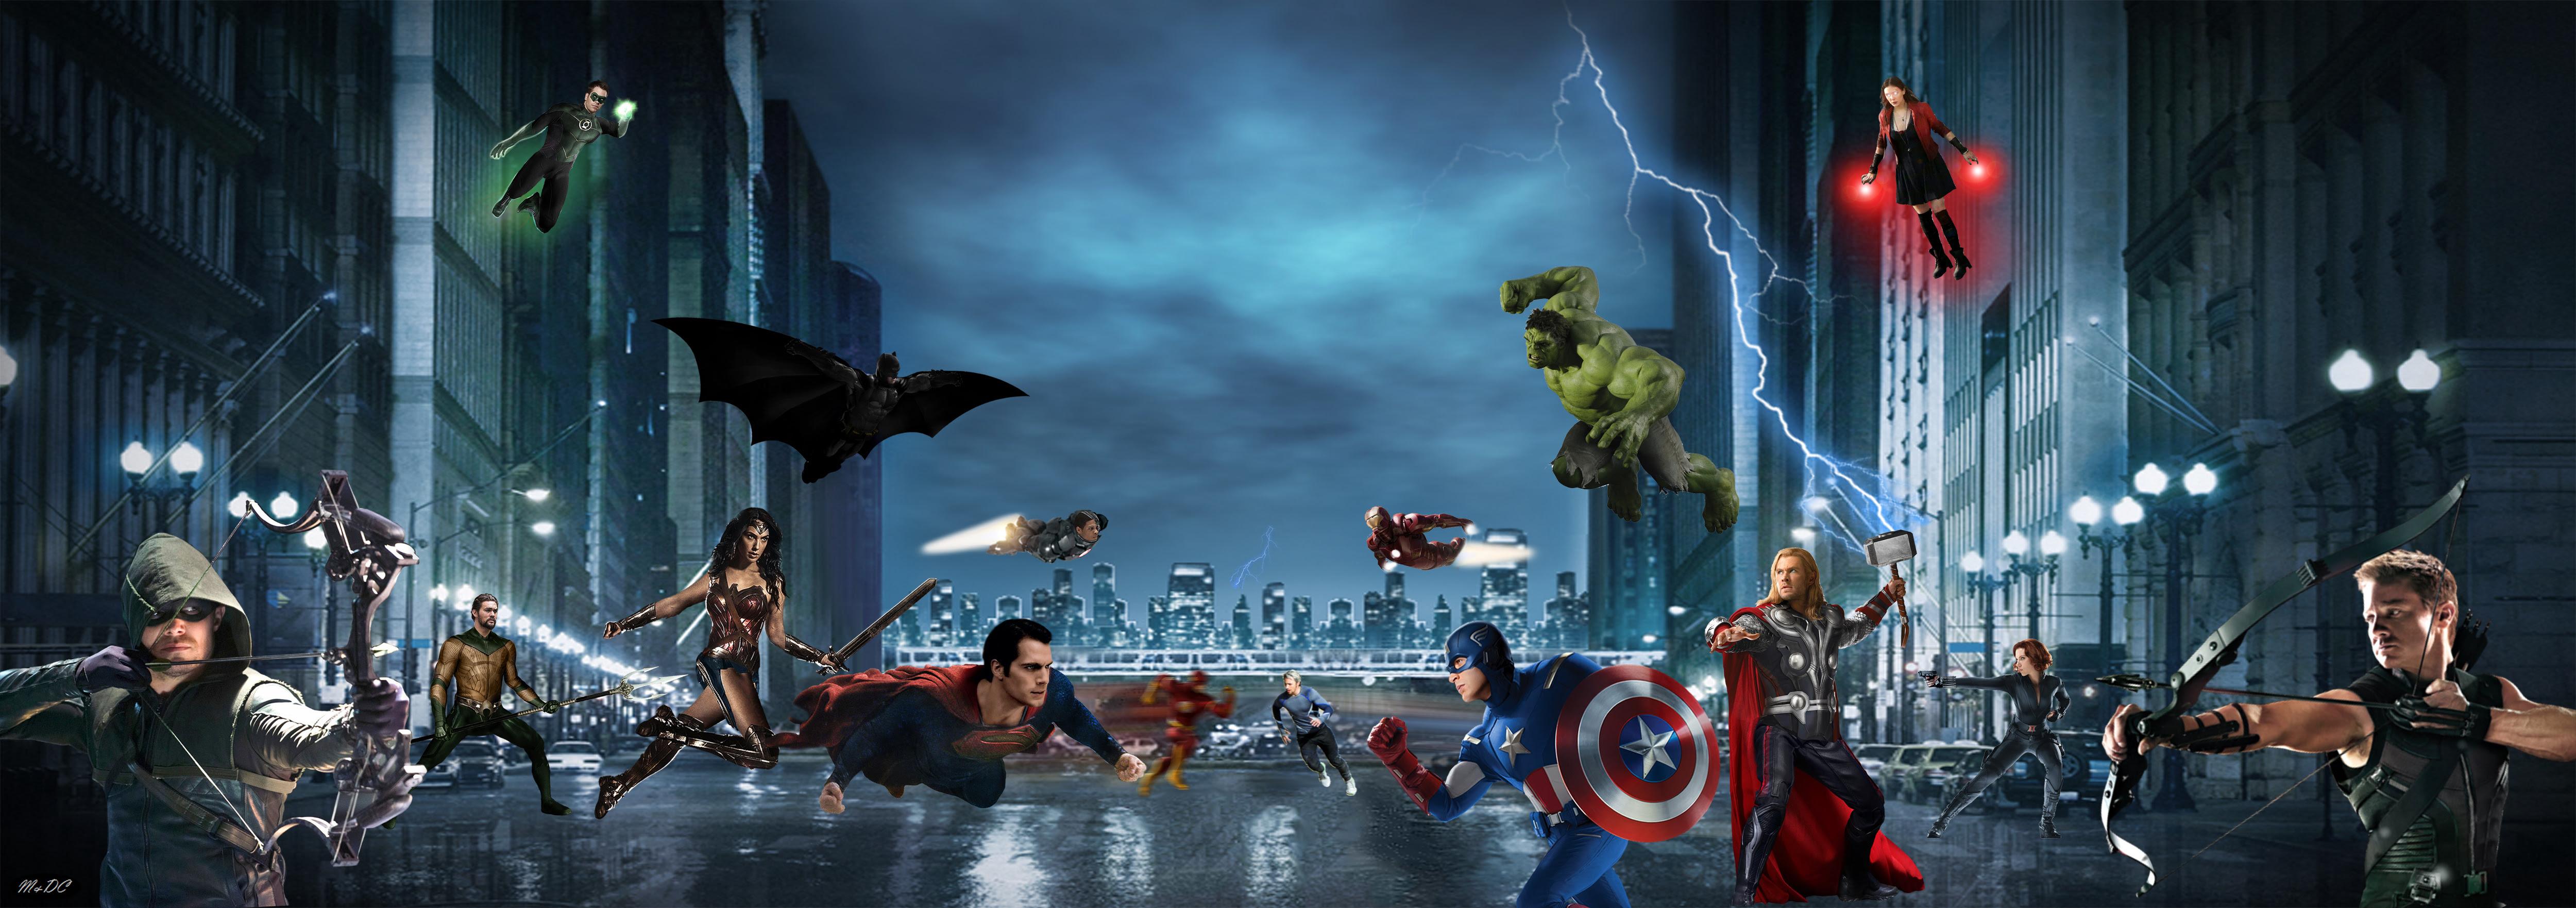 Batman Vs Superman Justice League Vs Avengers Wallpaper Images